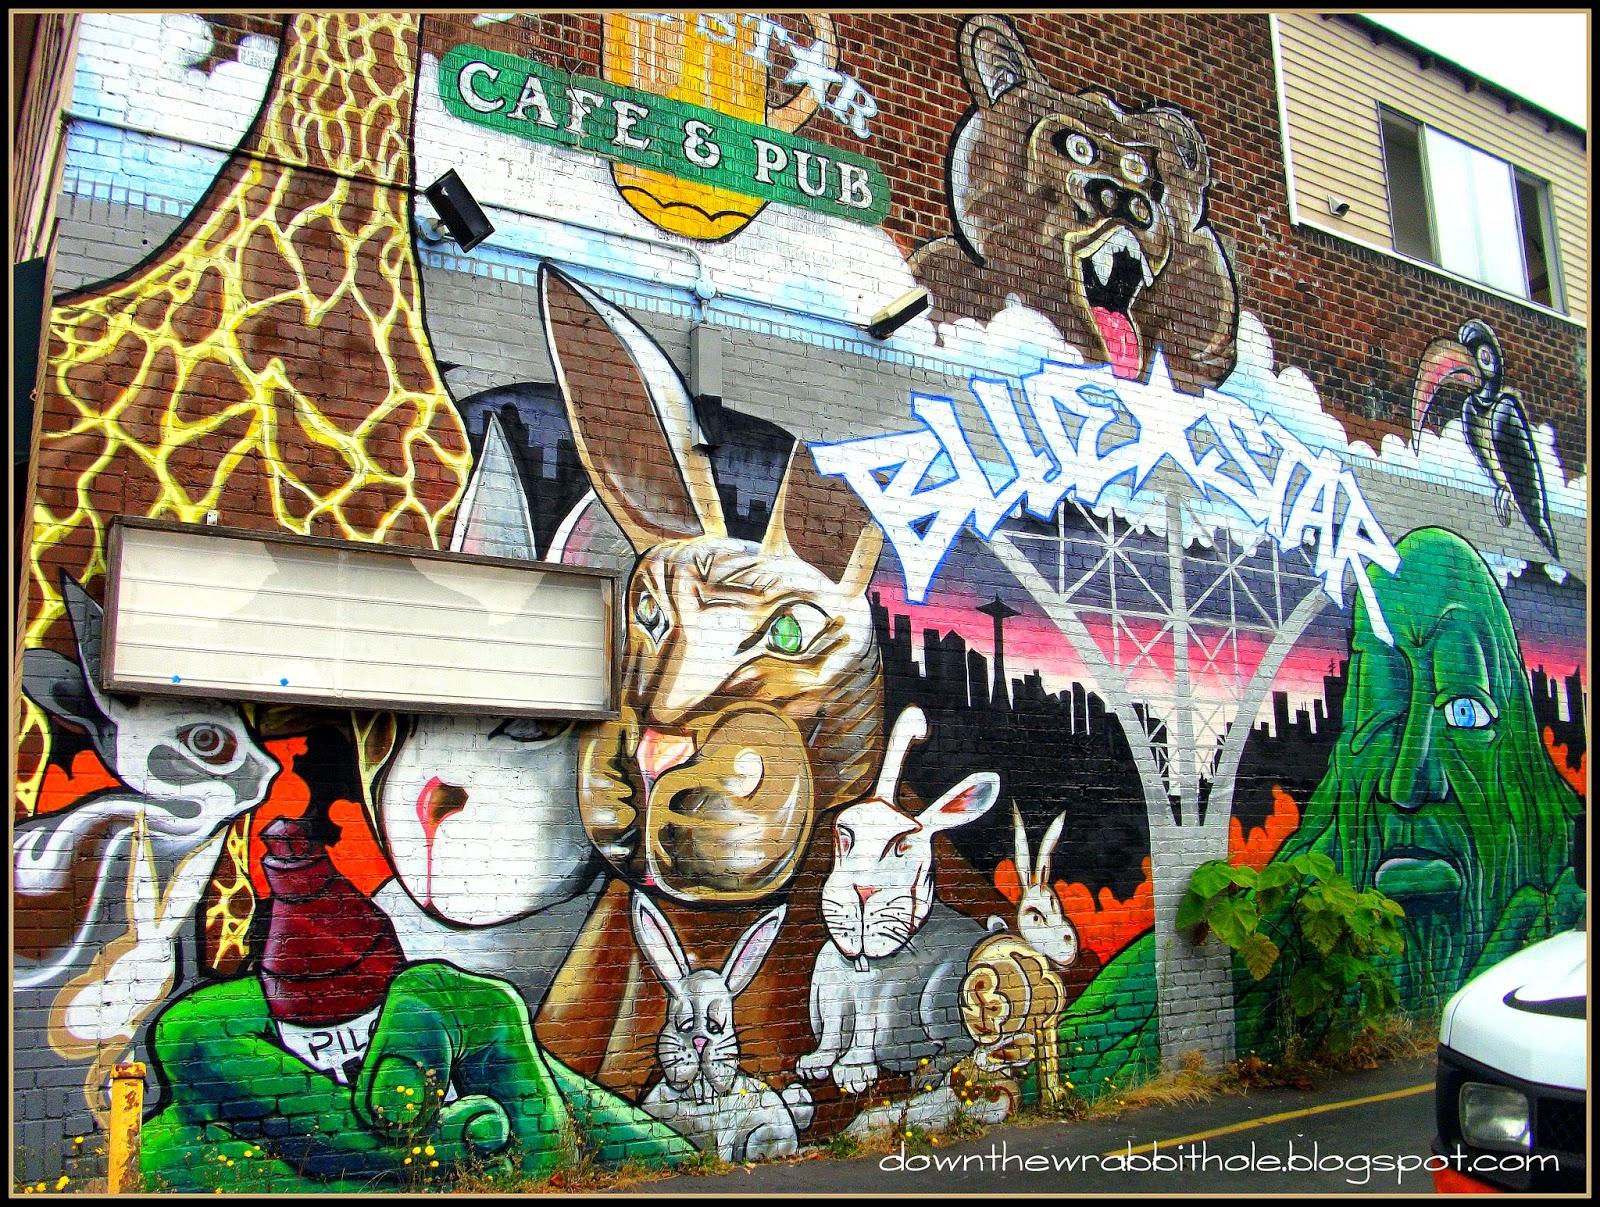 Seattle street art wall graffiti